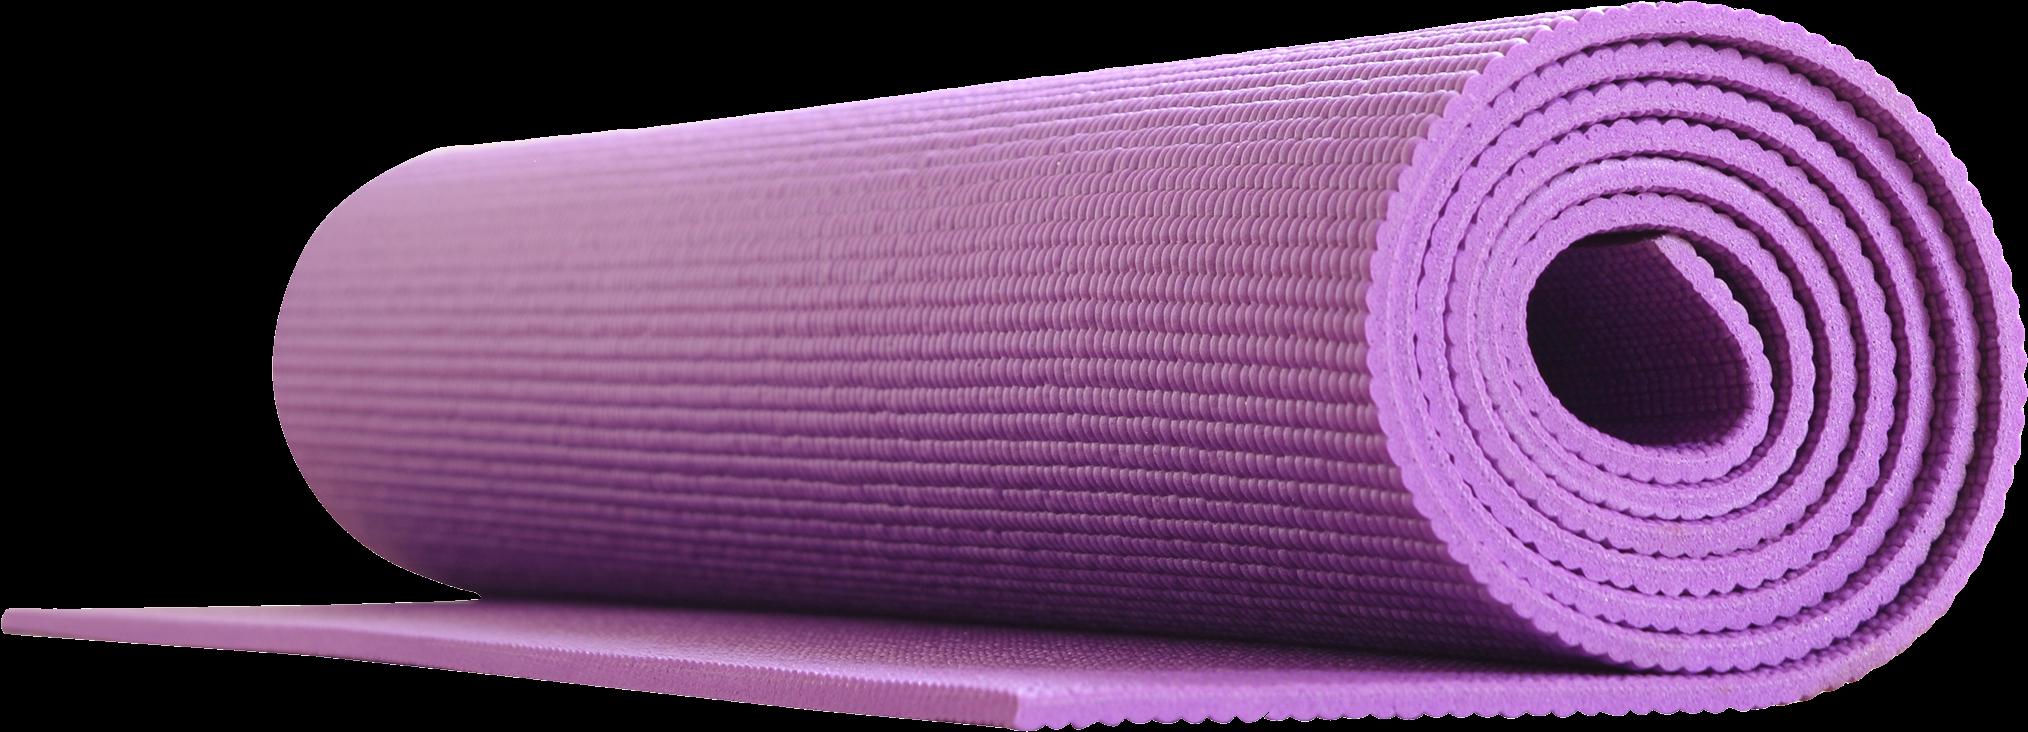 Download Yoga Mat Png Transparent Image Yoga Mat Png Full Size Png Image Pngkit